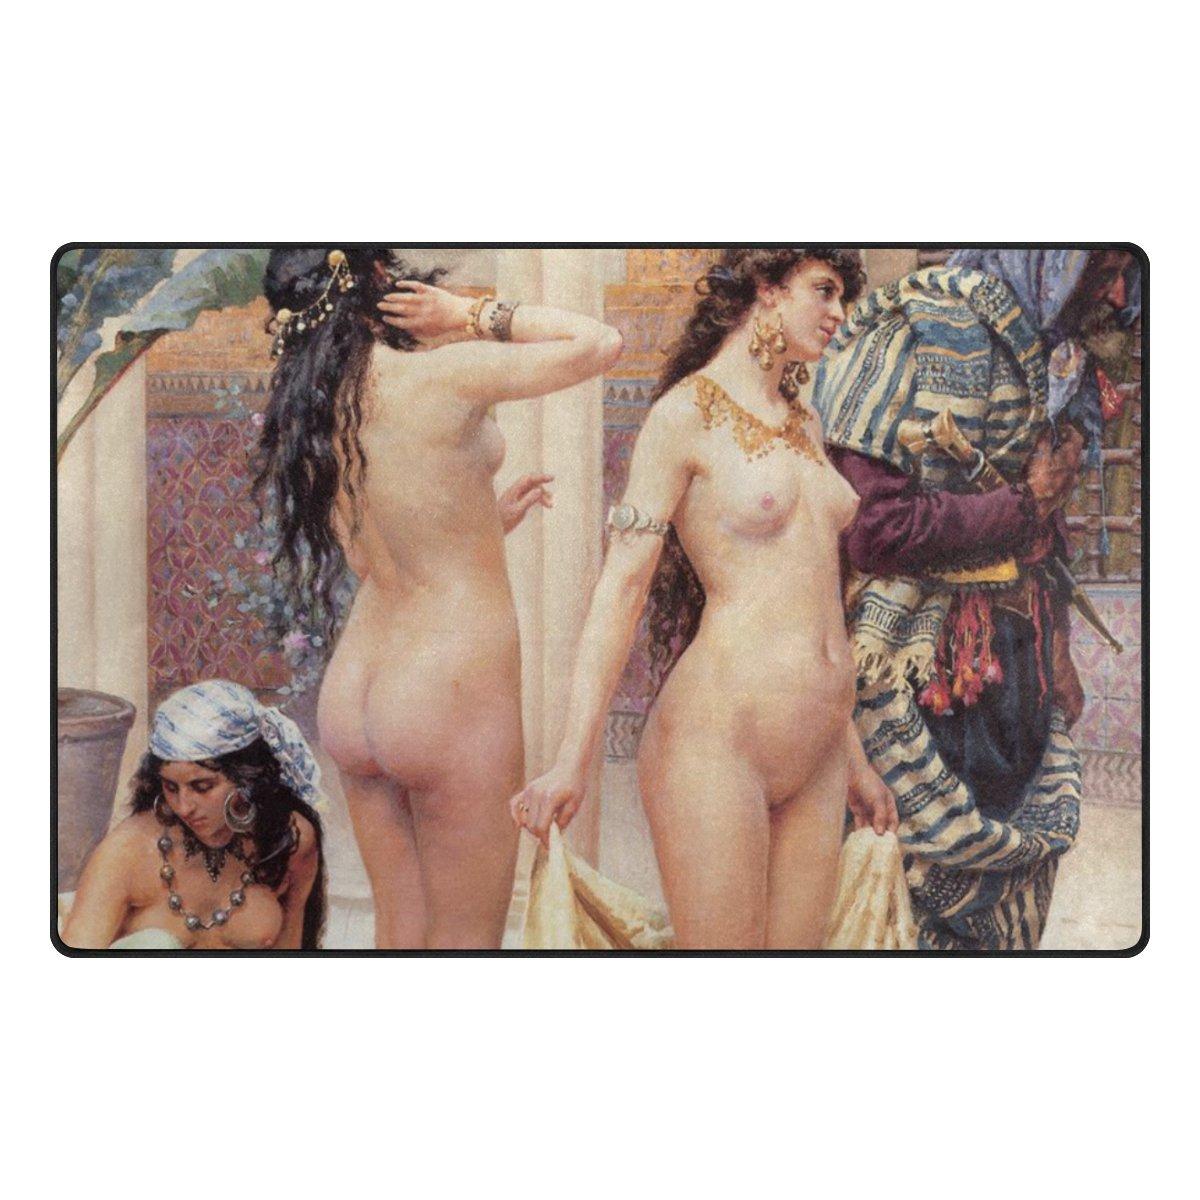 LEEZONE before Bathing Woman Printing Rectangle Decorative Floor Mat Carpet